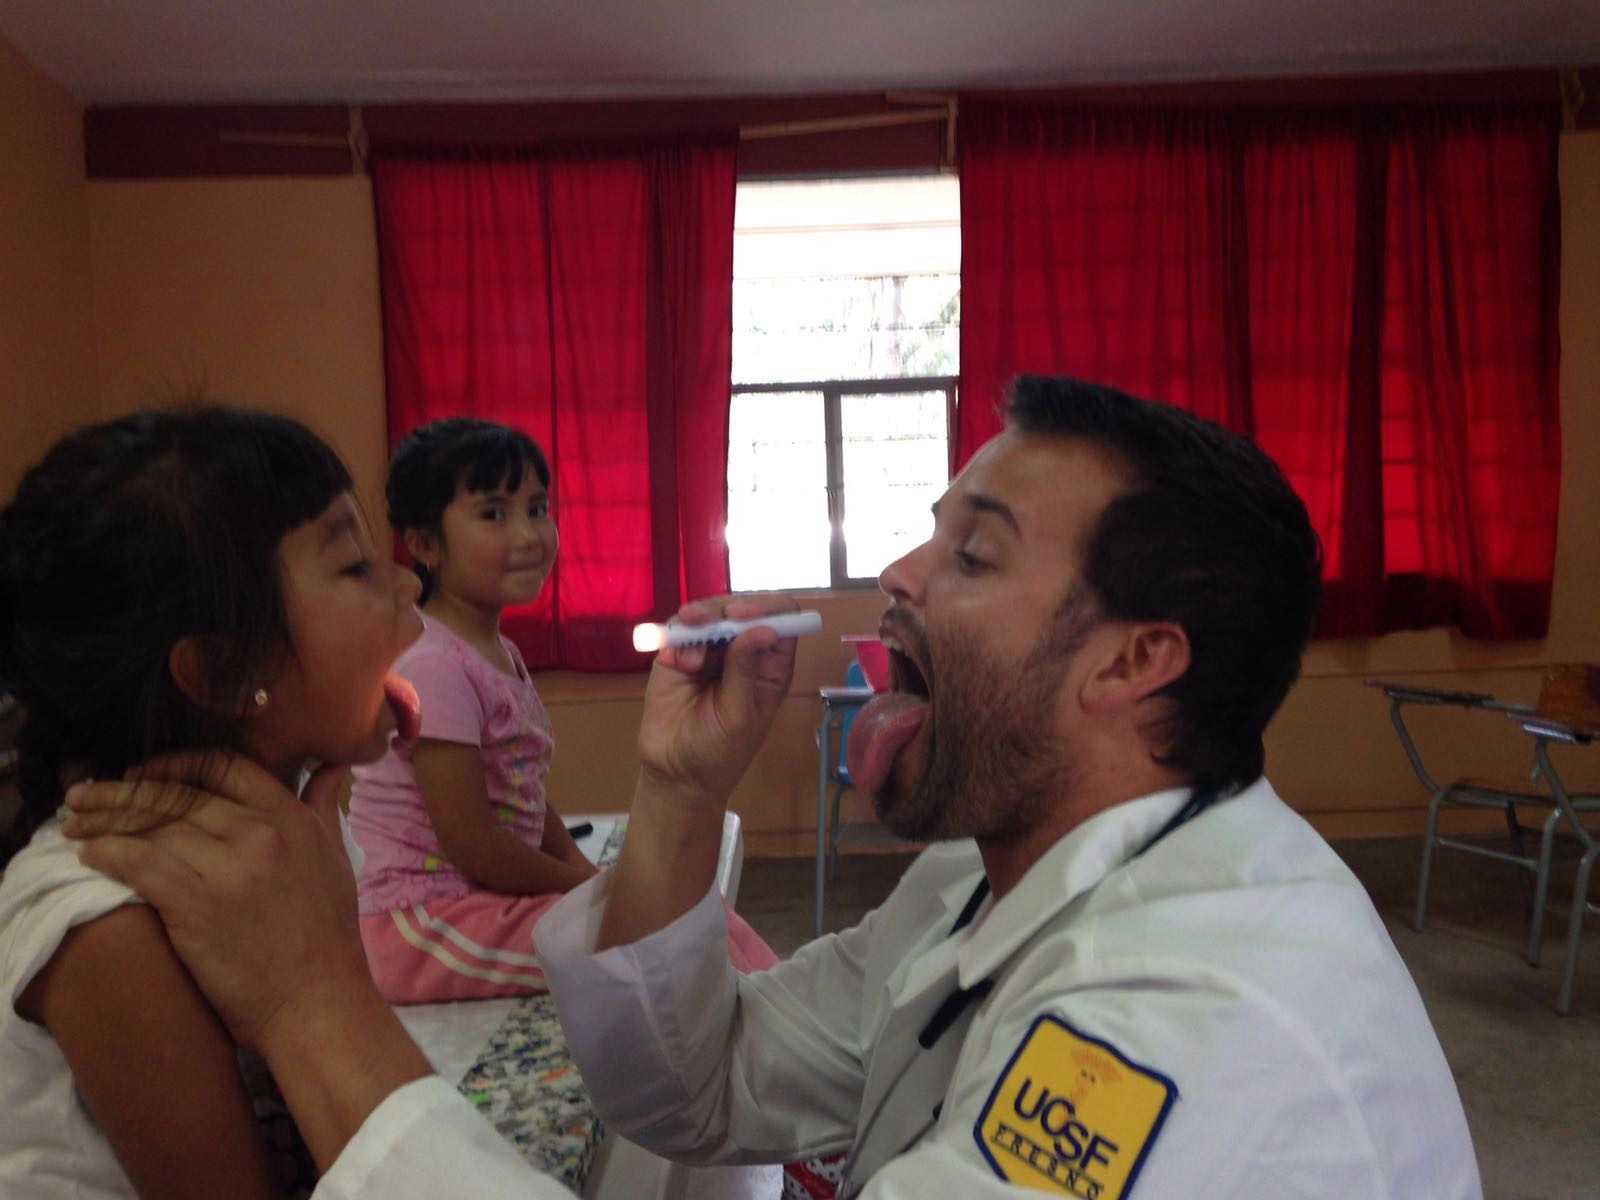 doctor-flashlight-pediatrician-child-patient-